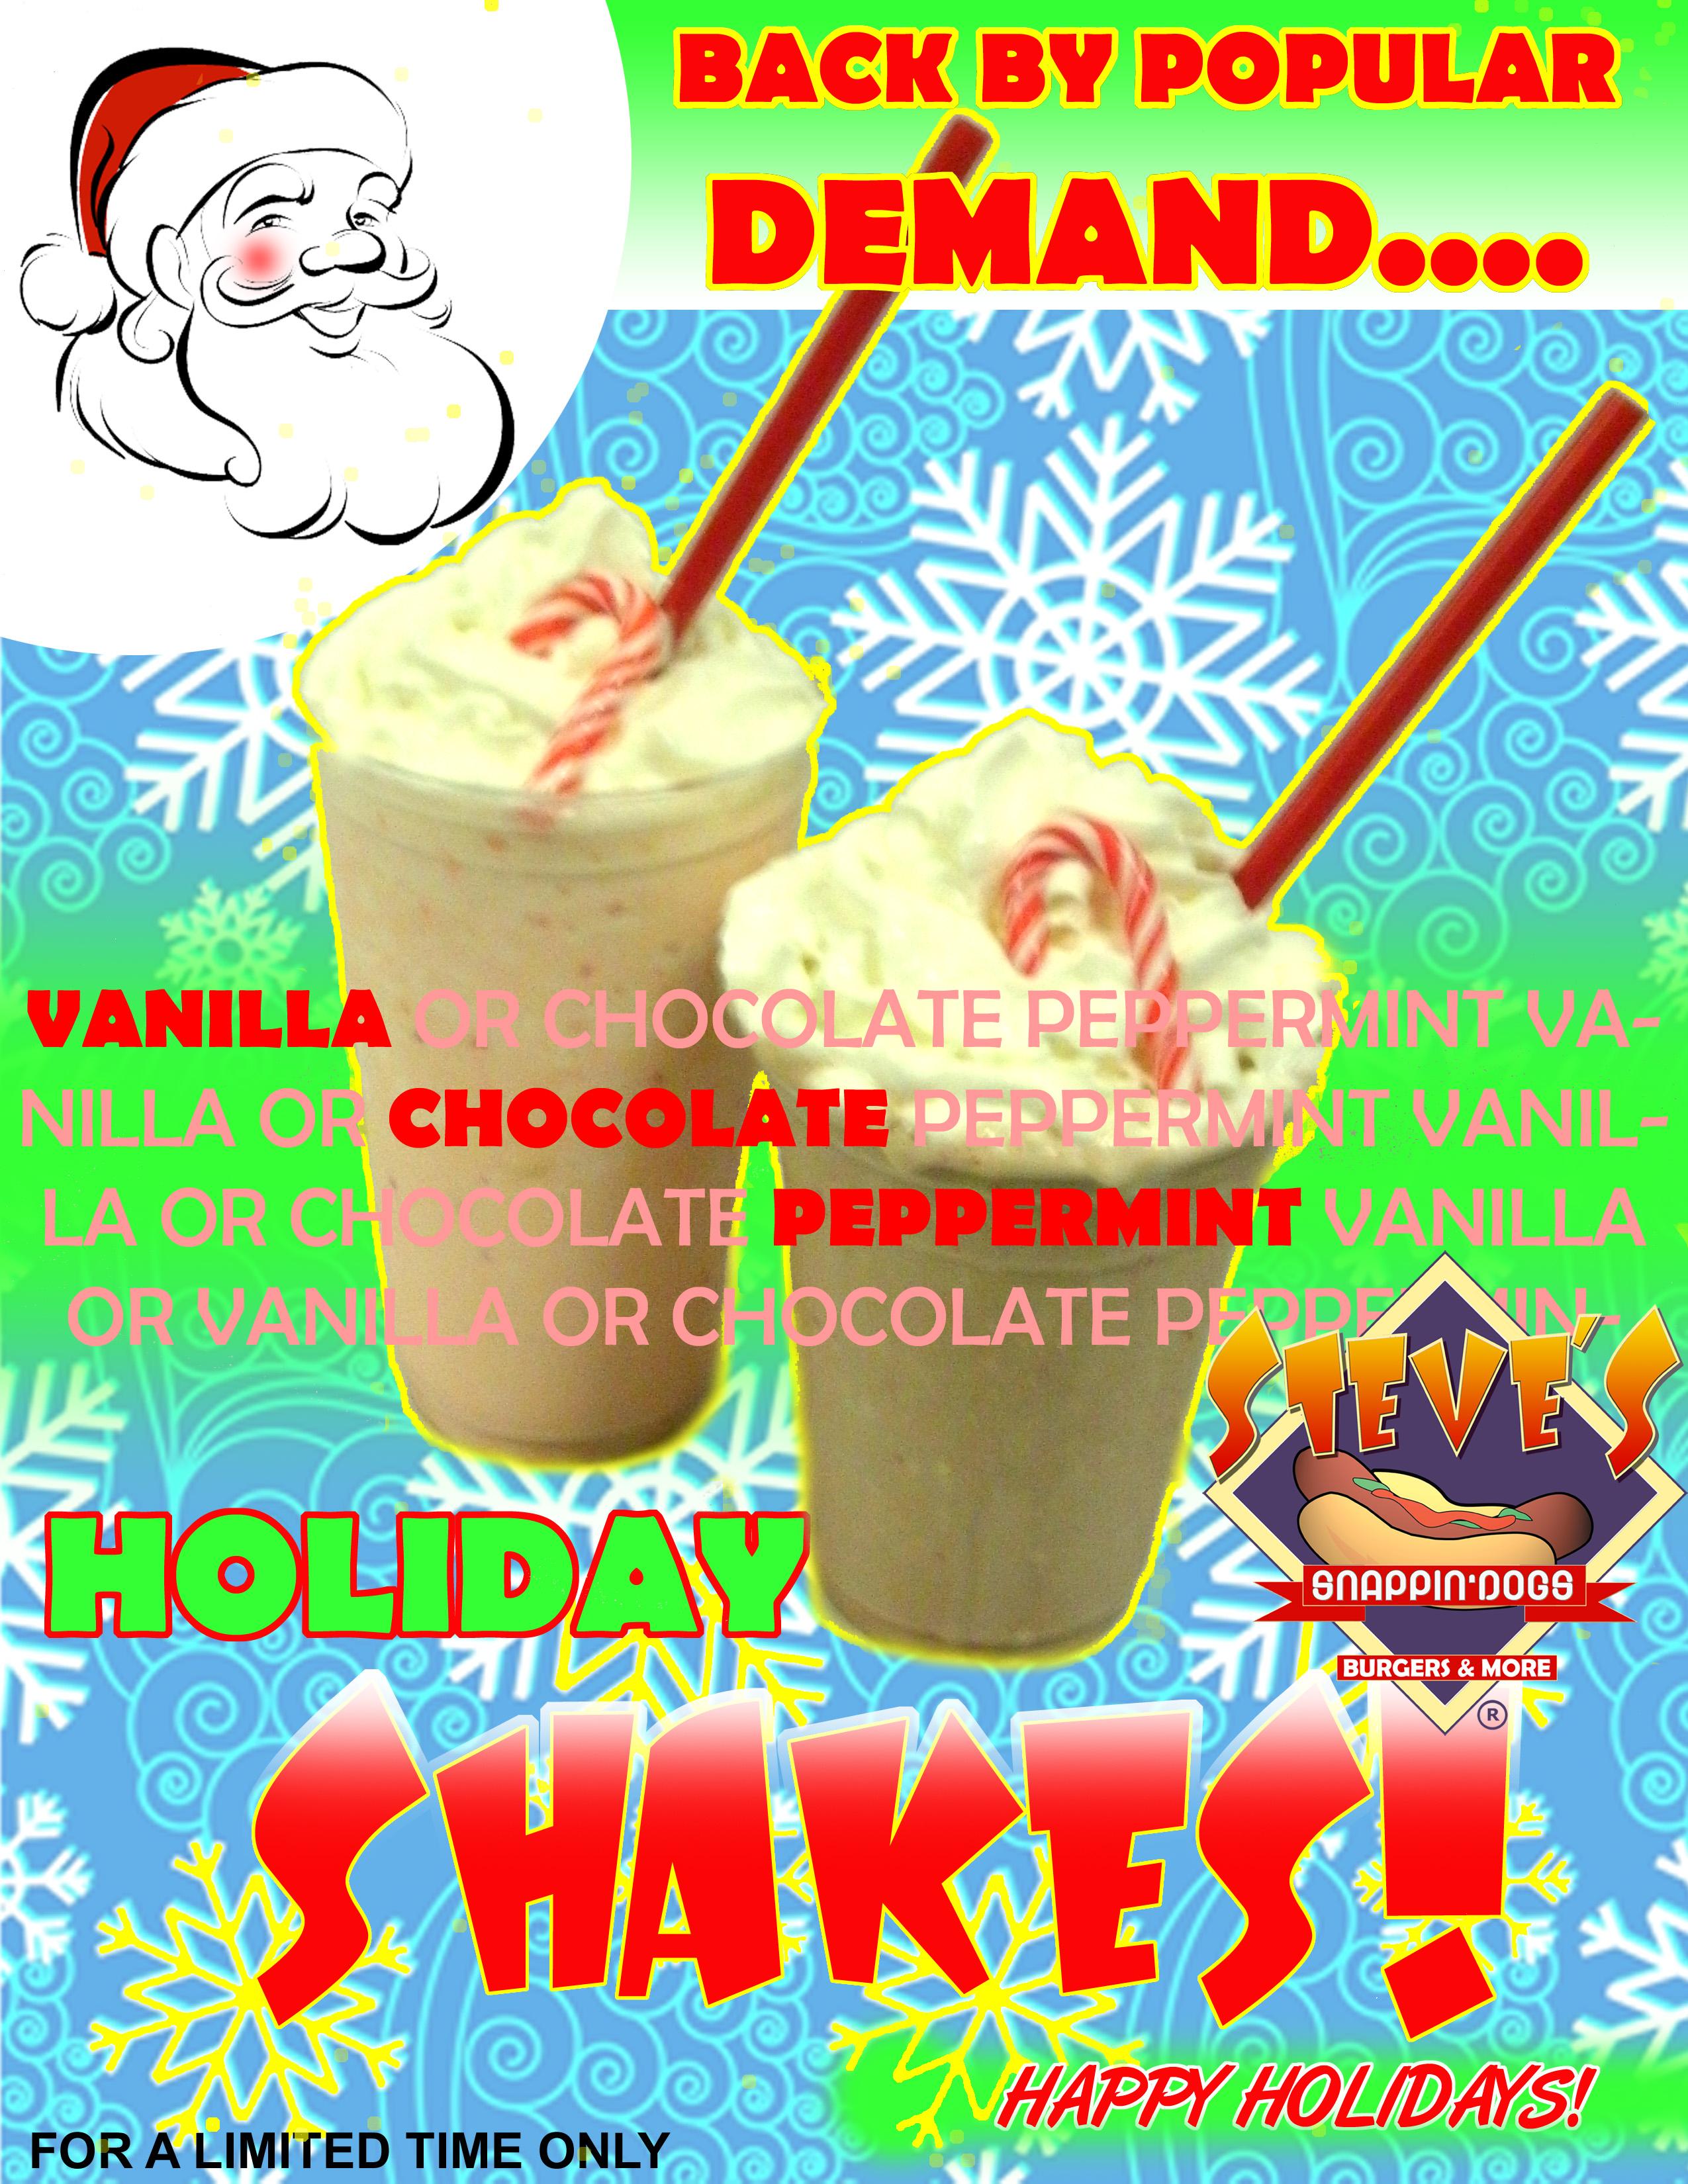 Shake it up with Holiday Season